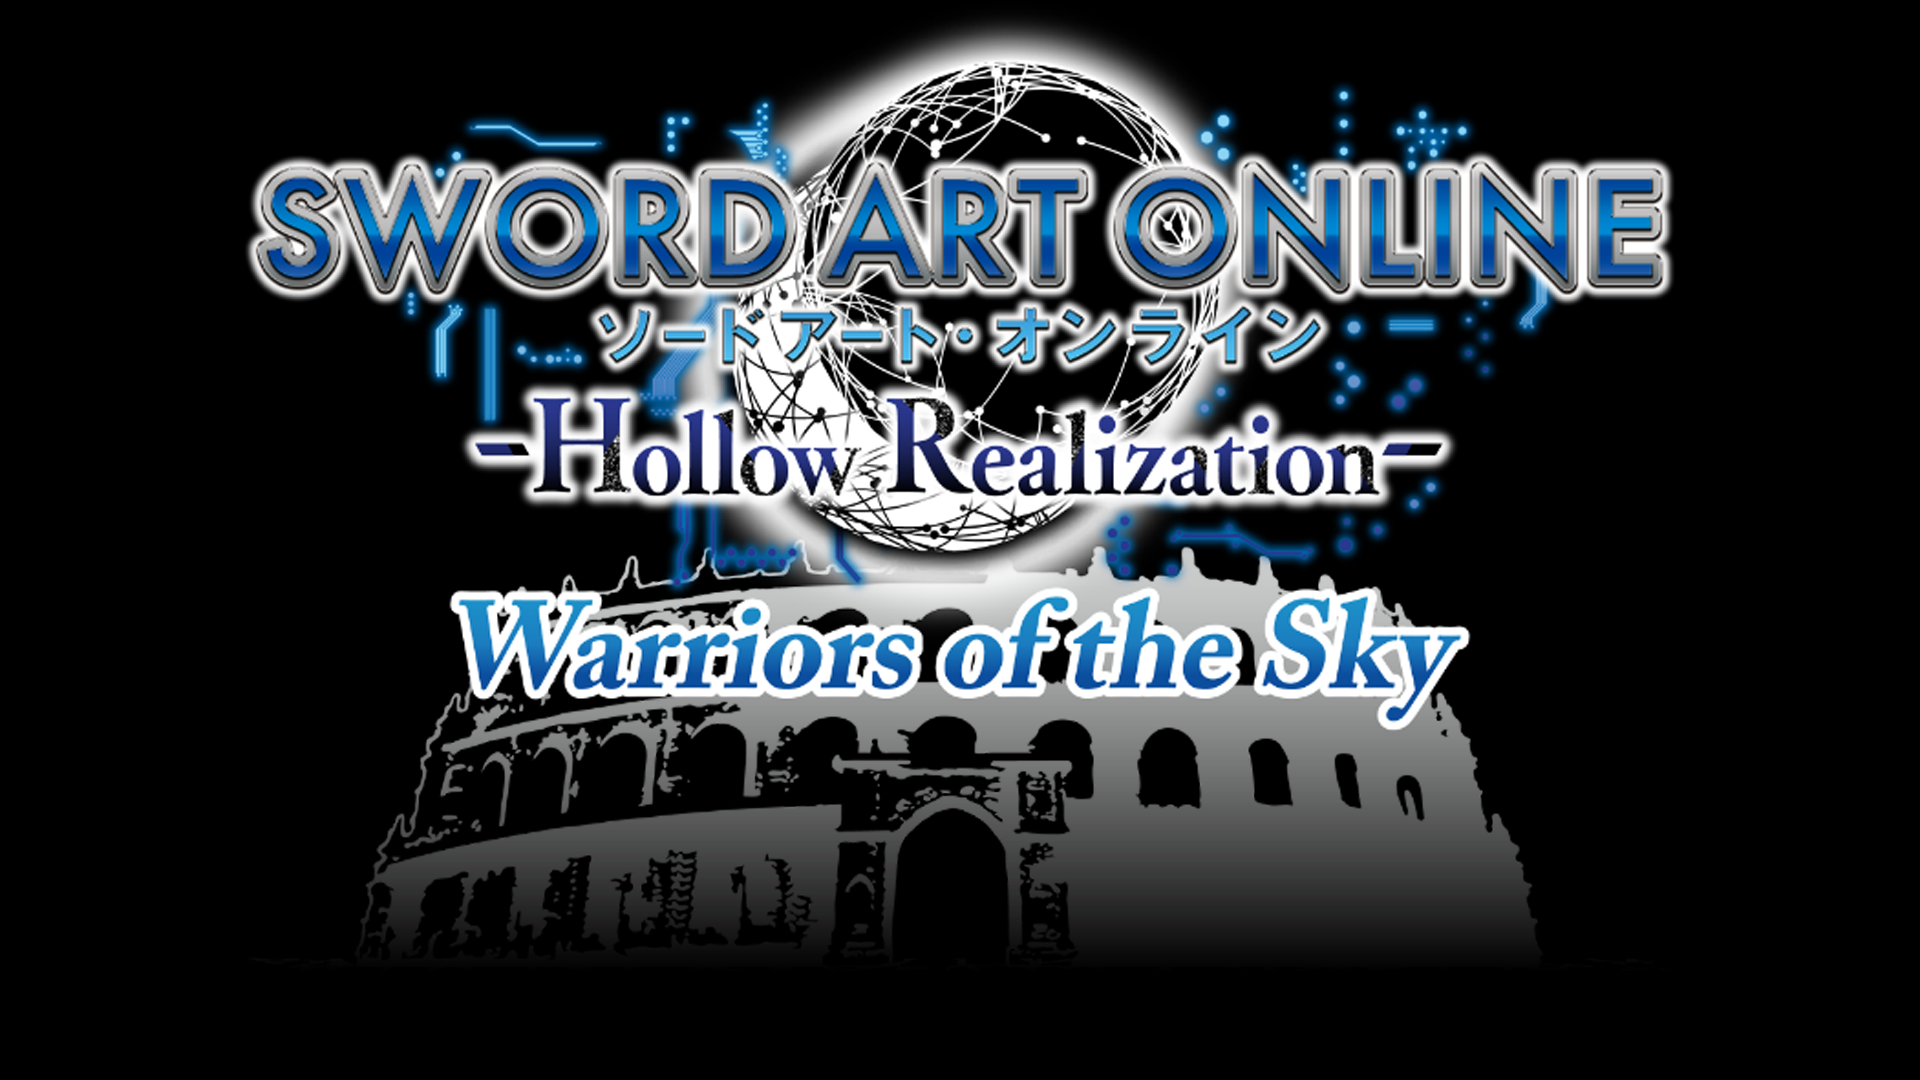 Sword Art Online Hollow Realization - Warriors of the Sky